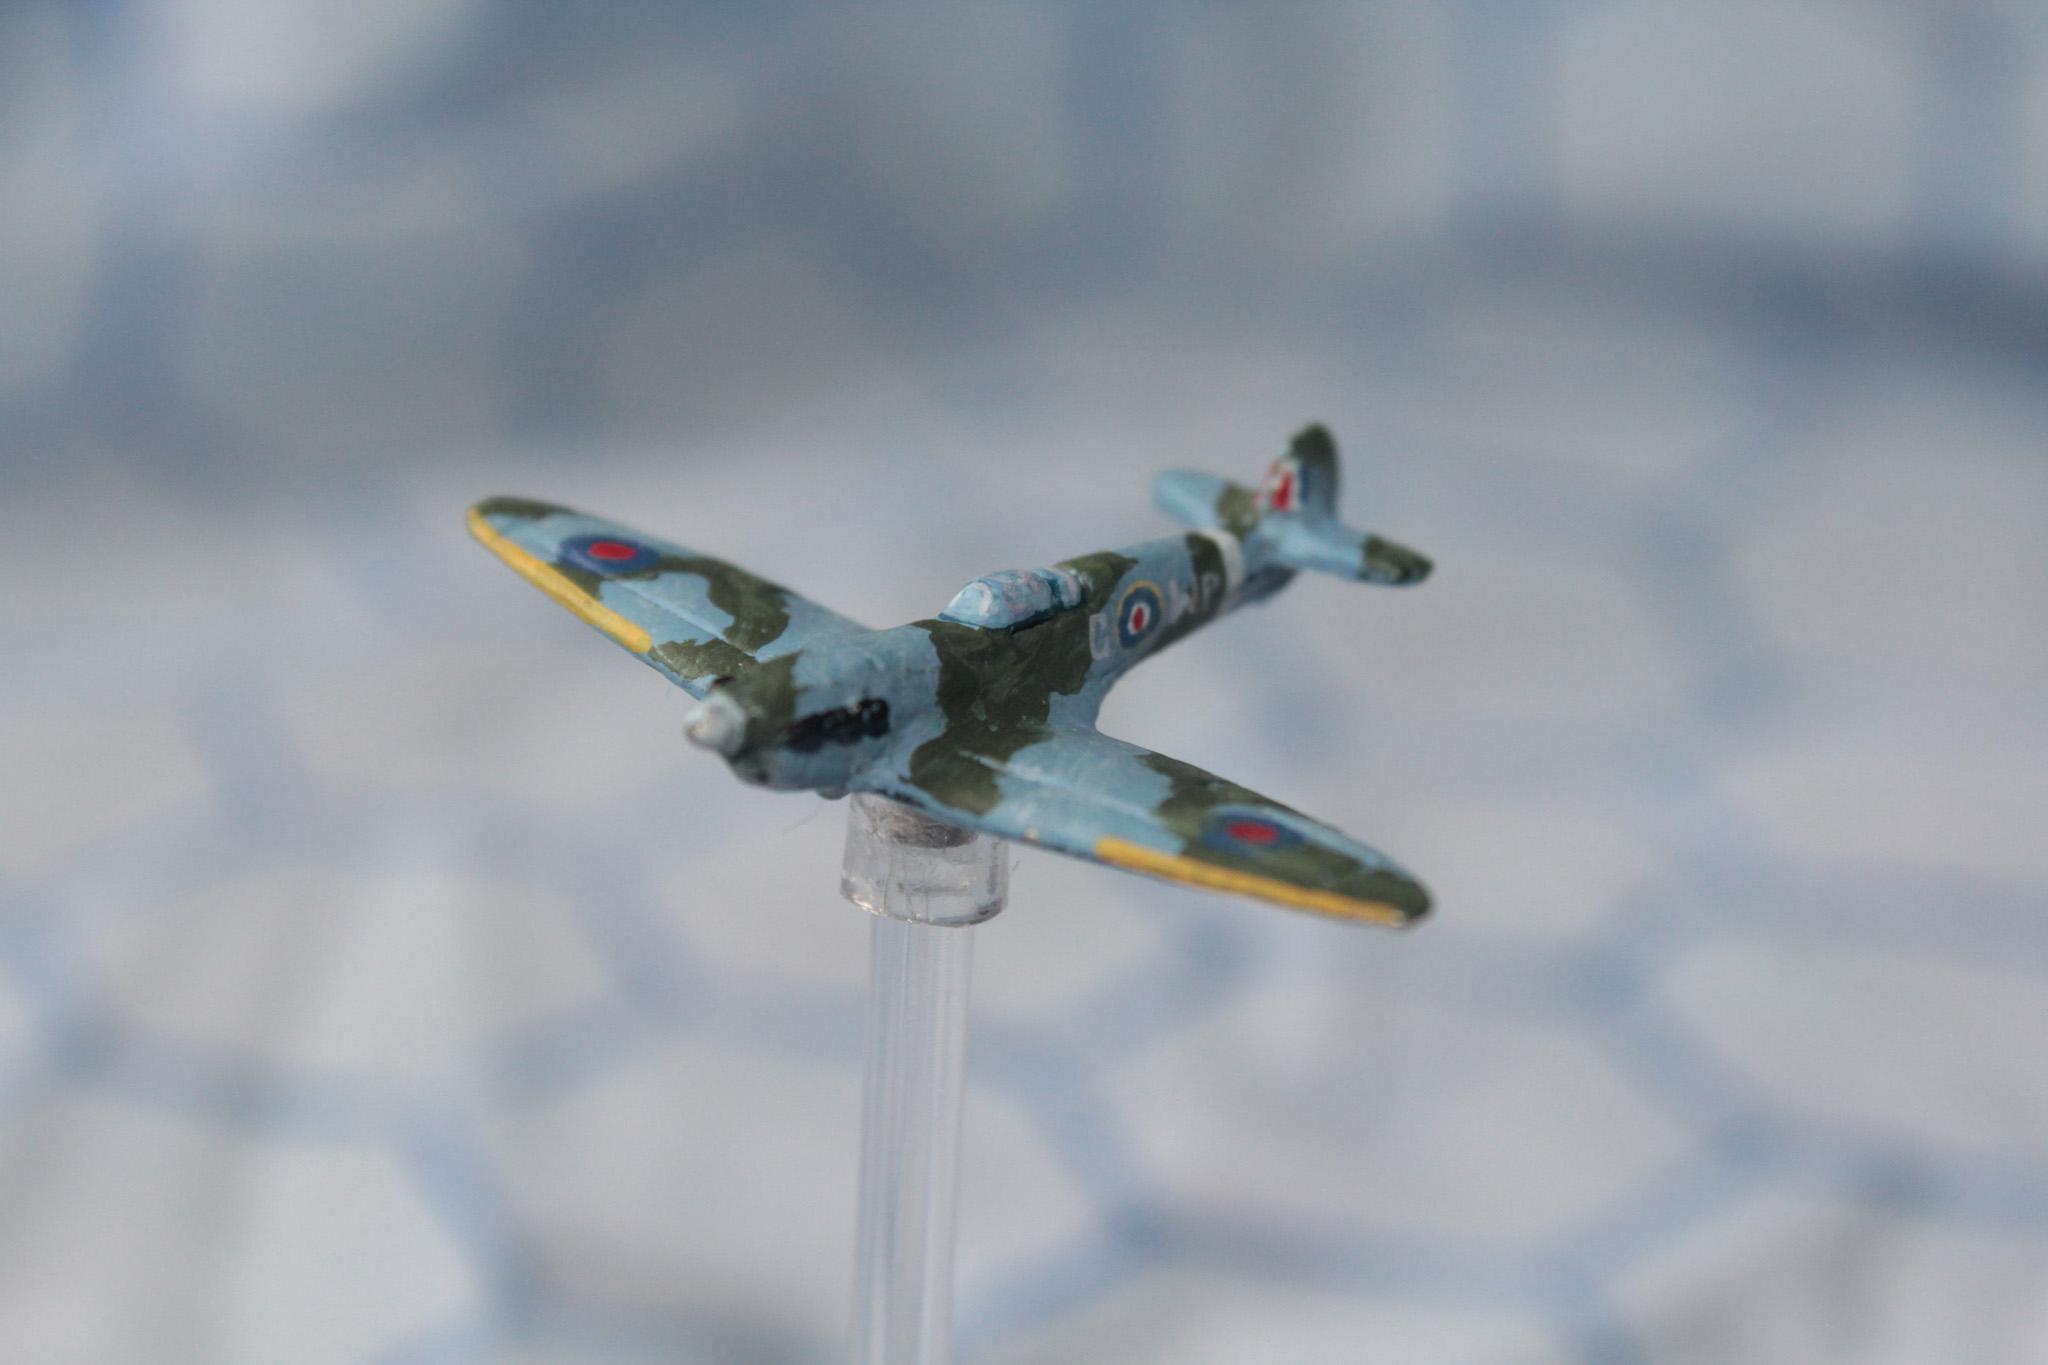 1:300, 6mm, Airborne, Aircraft, Airplane, Aviation, Check Your 6!, Fliers, Planes, Raf, Spitfire, World War 2